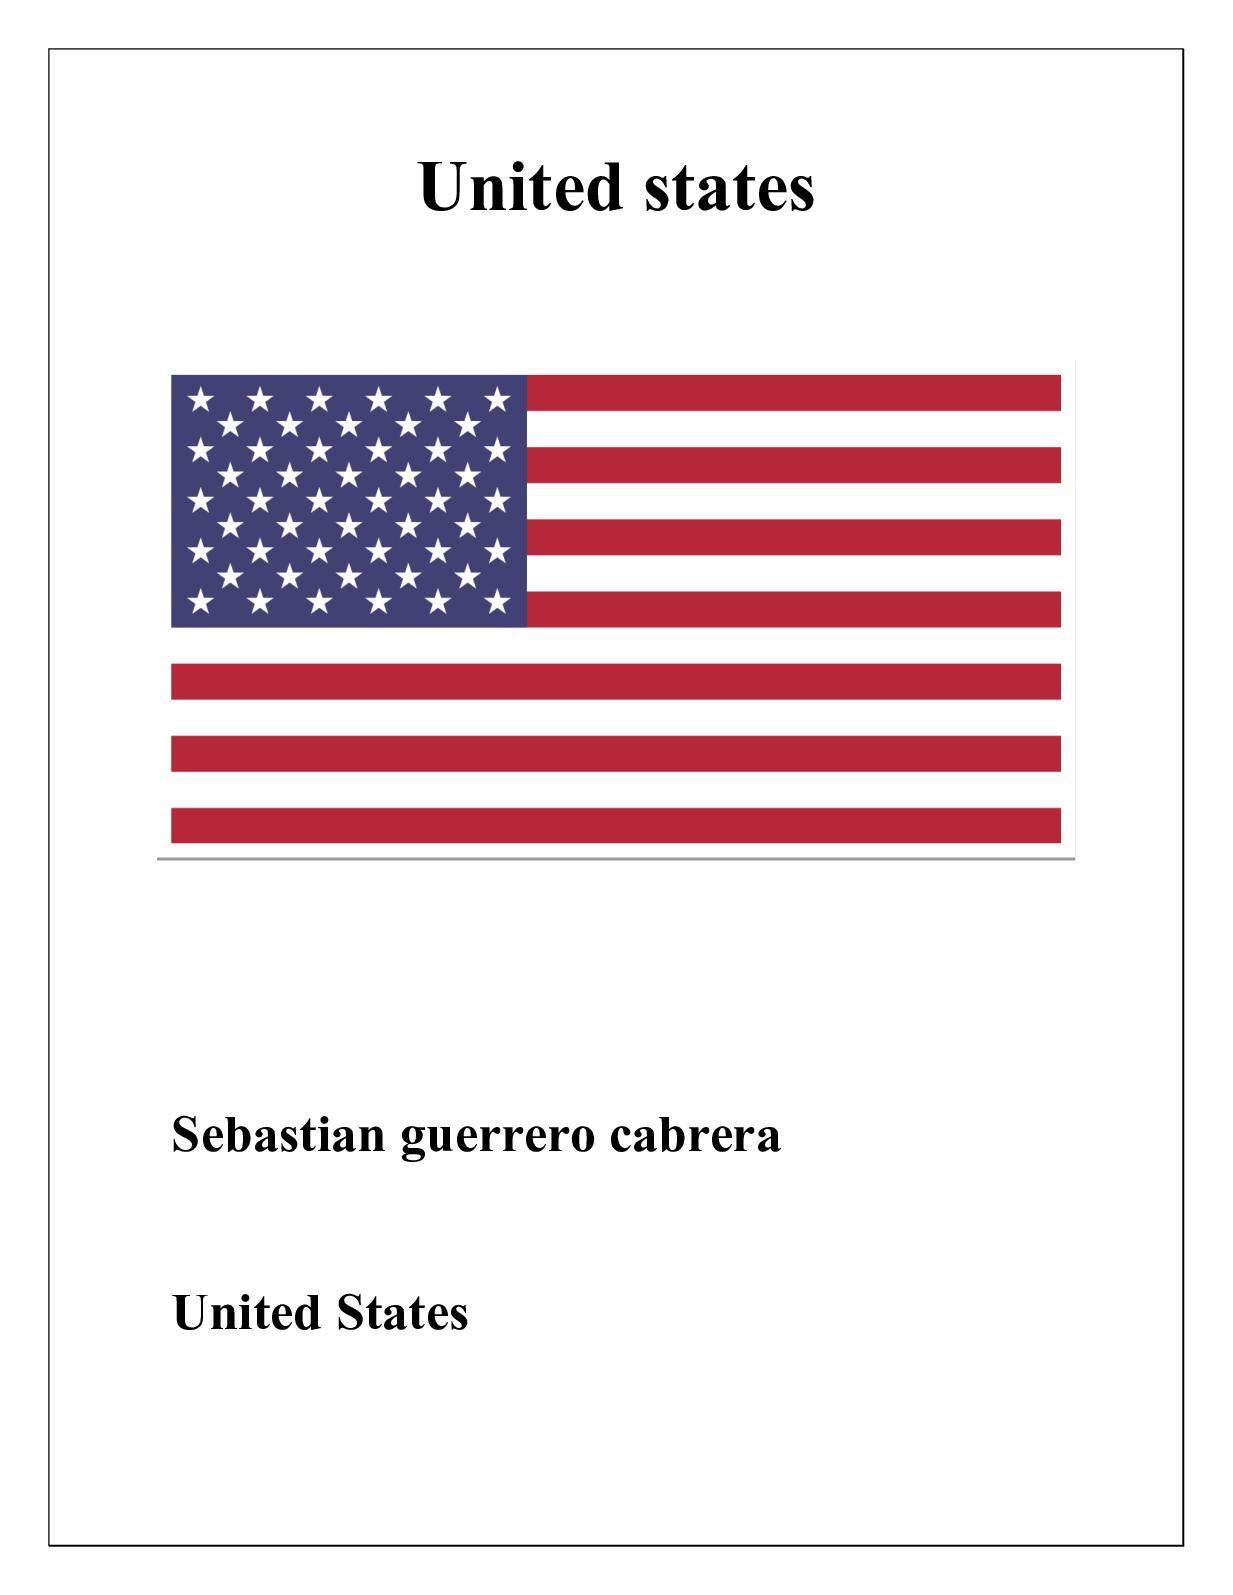 United States (1)